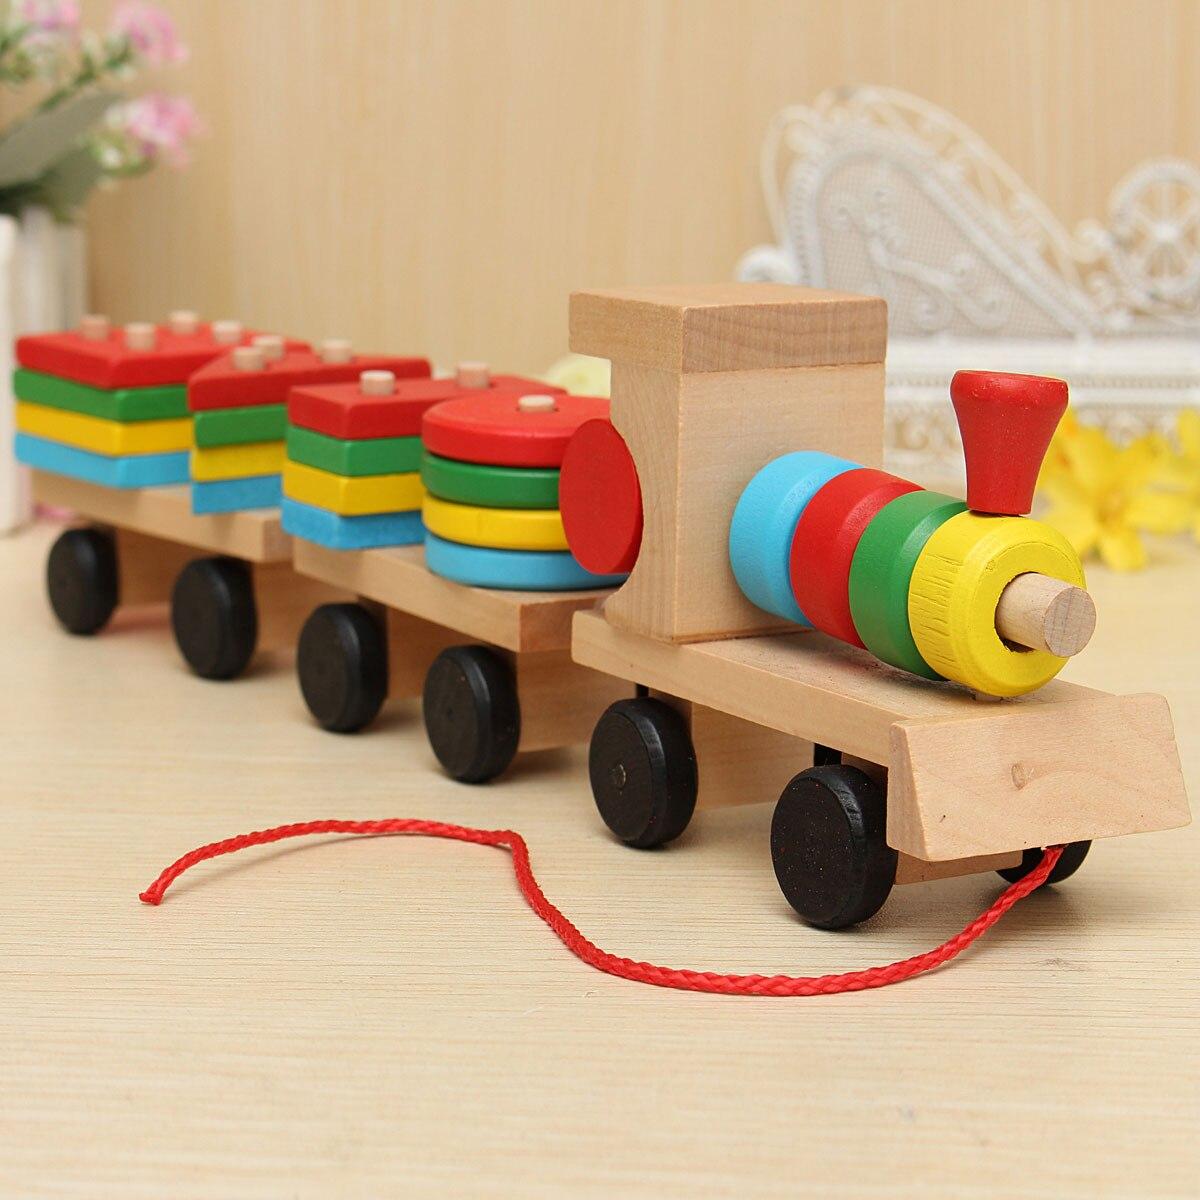 Jimitu Kids Trailer Baby Toys Wooden Train Vehicle Blocks Geometry/colour Congnitive Blocks Education Birthday/christmas Gift Mild And Mellow Toys & Hobbies